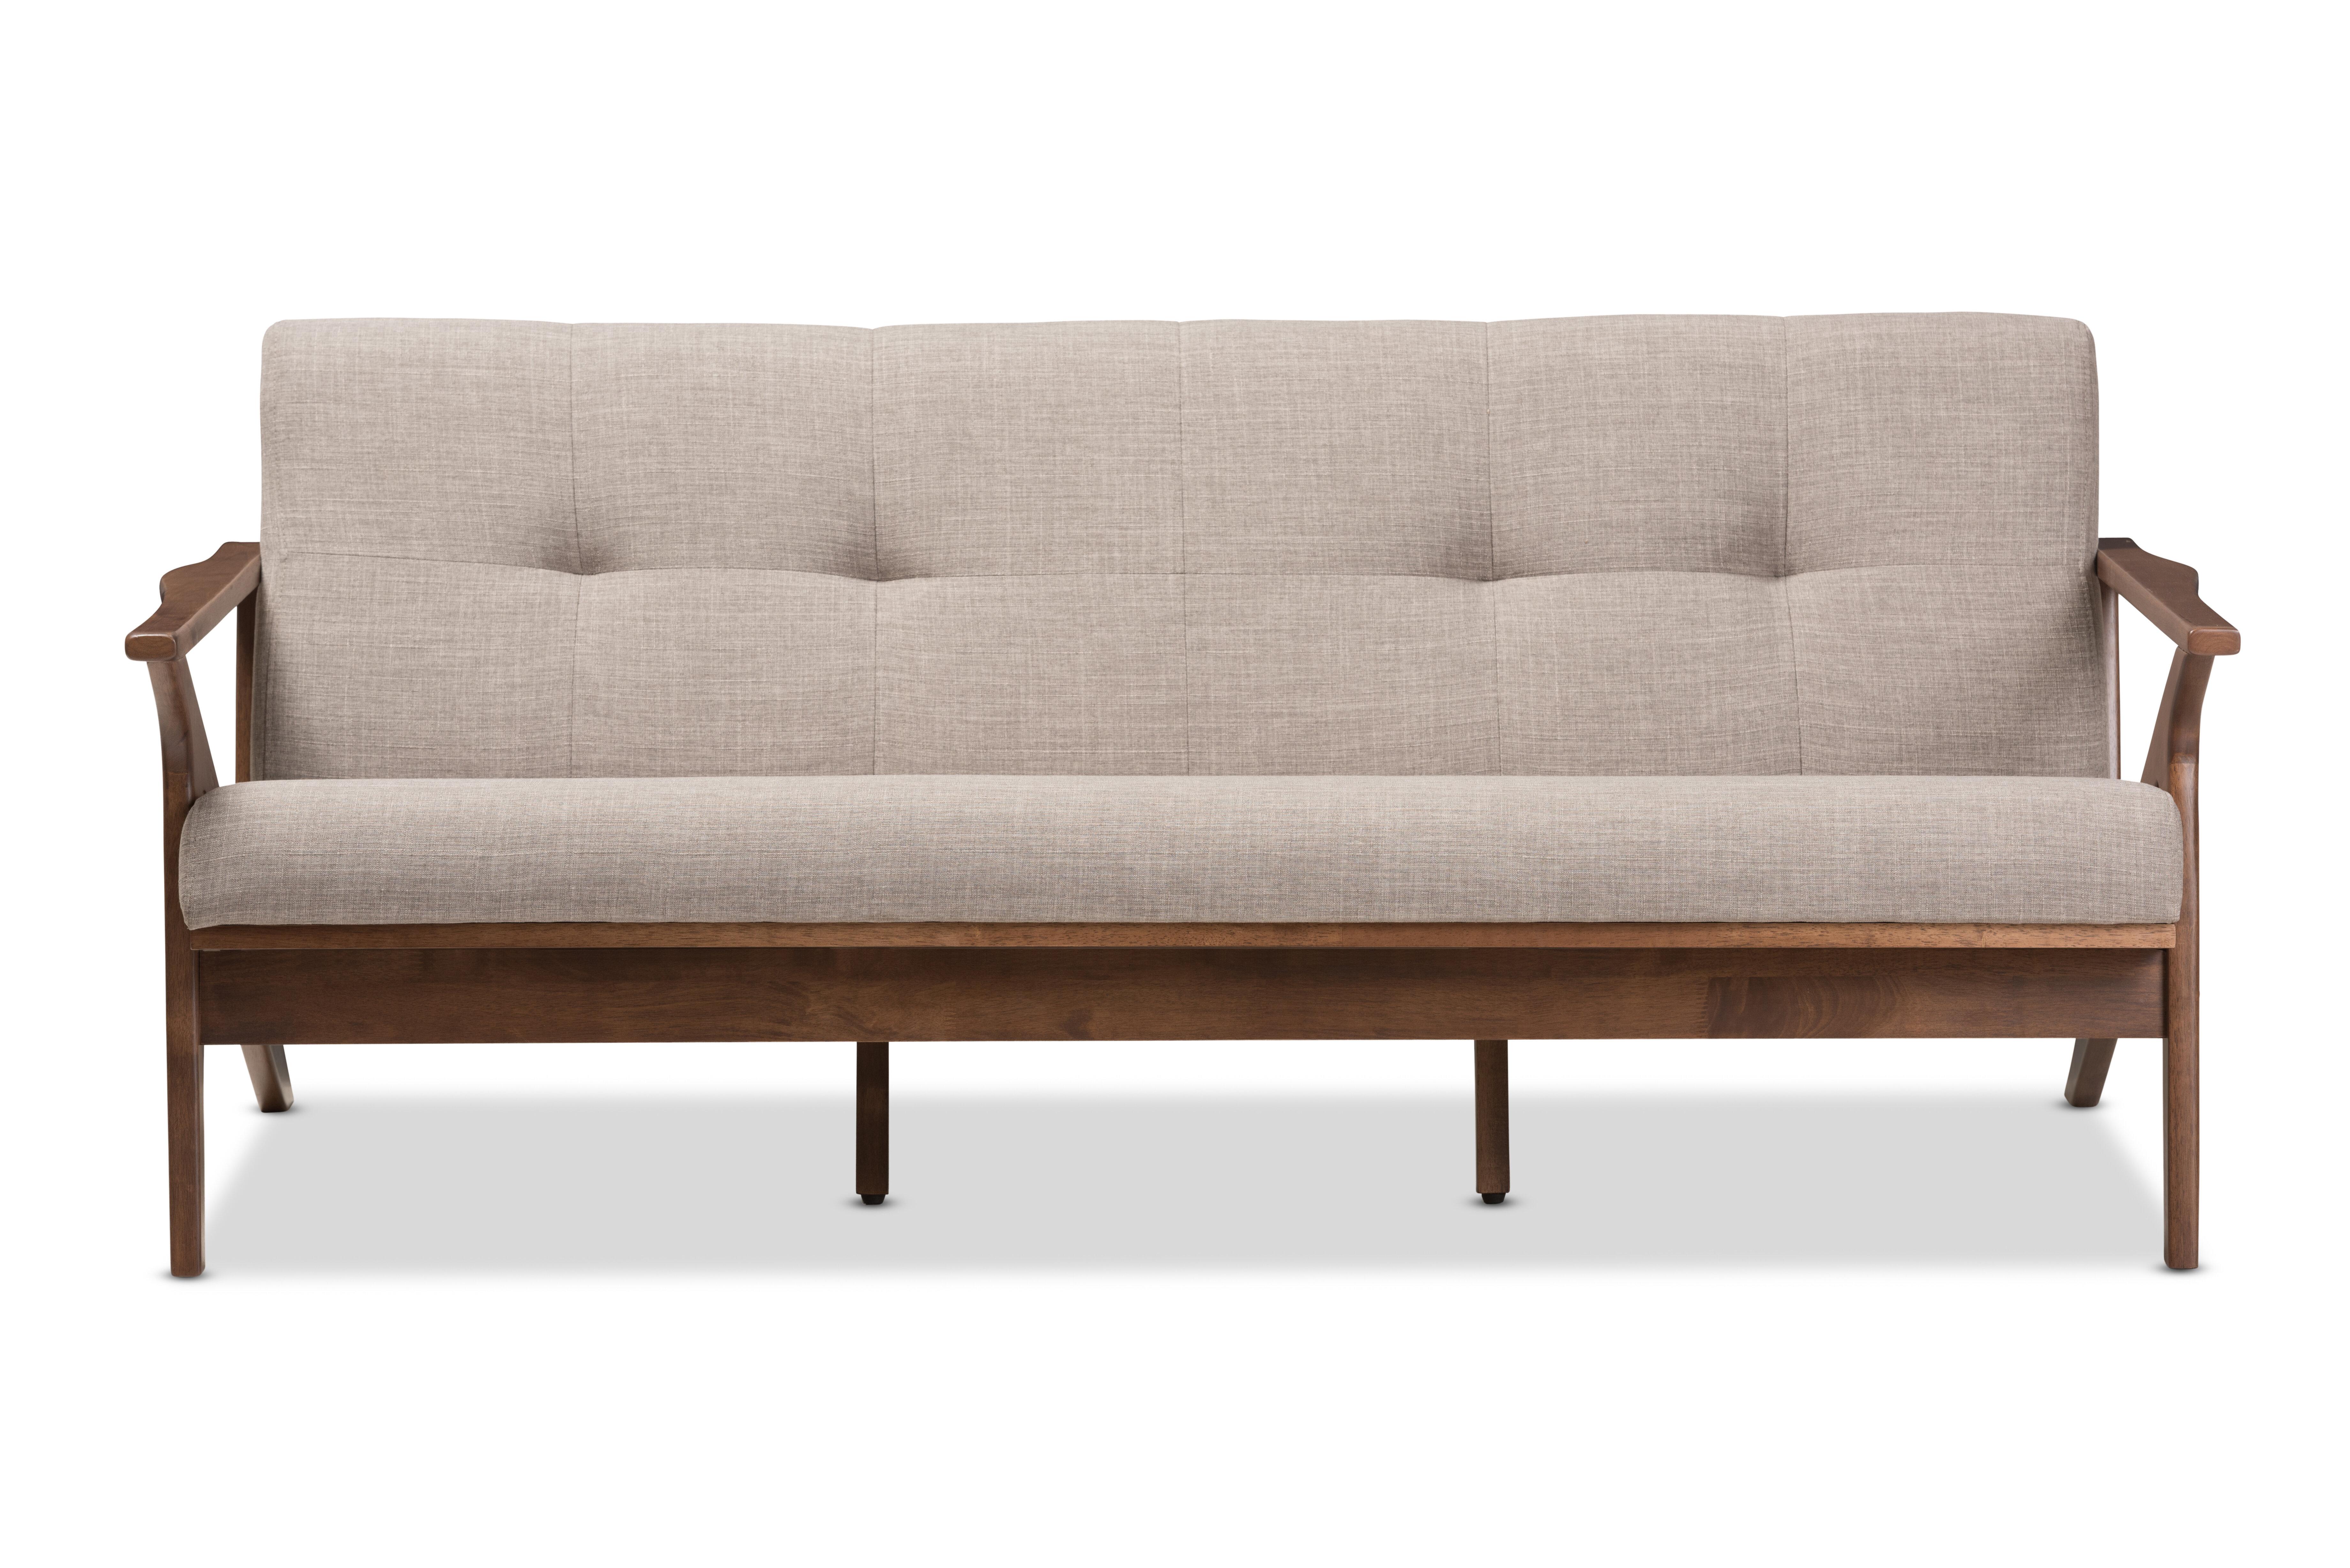 Union Rustic Wojtala Mid Century Modern Sofa Reviews Wayfair